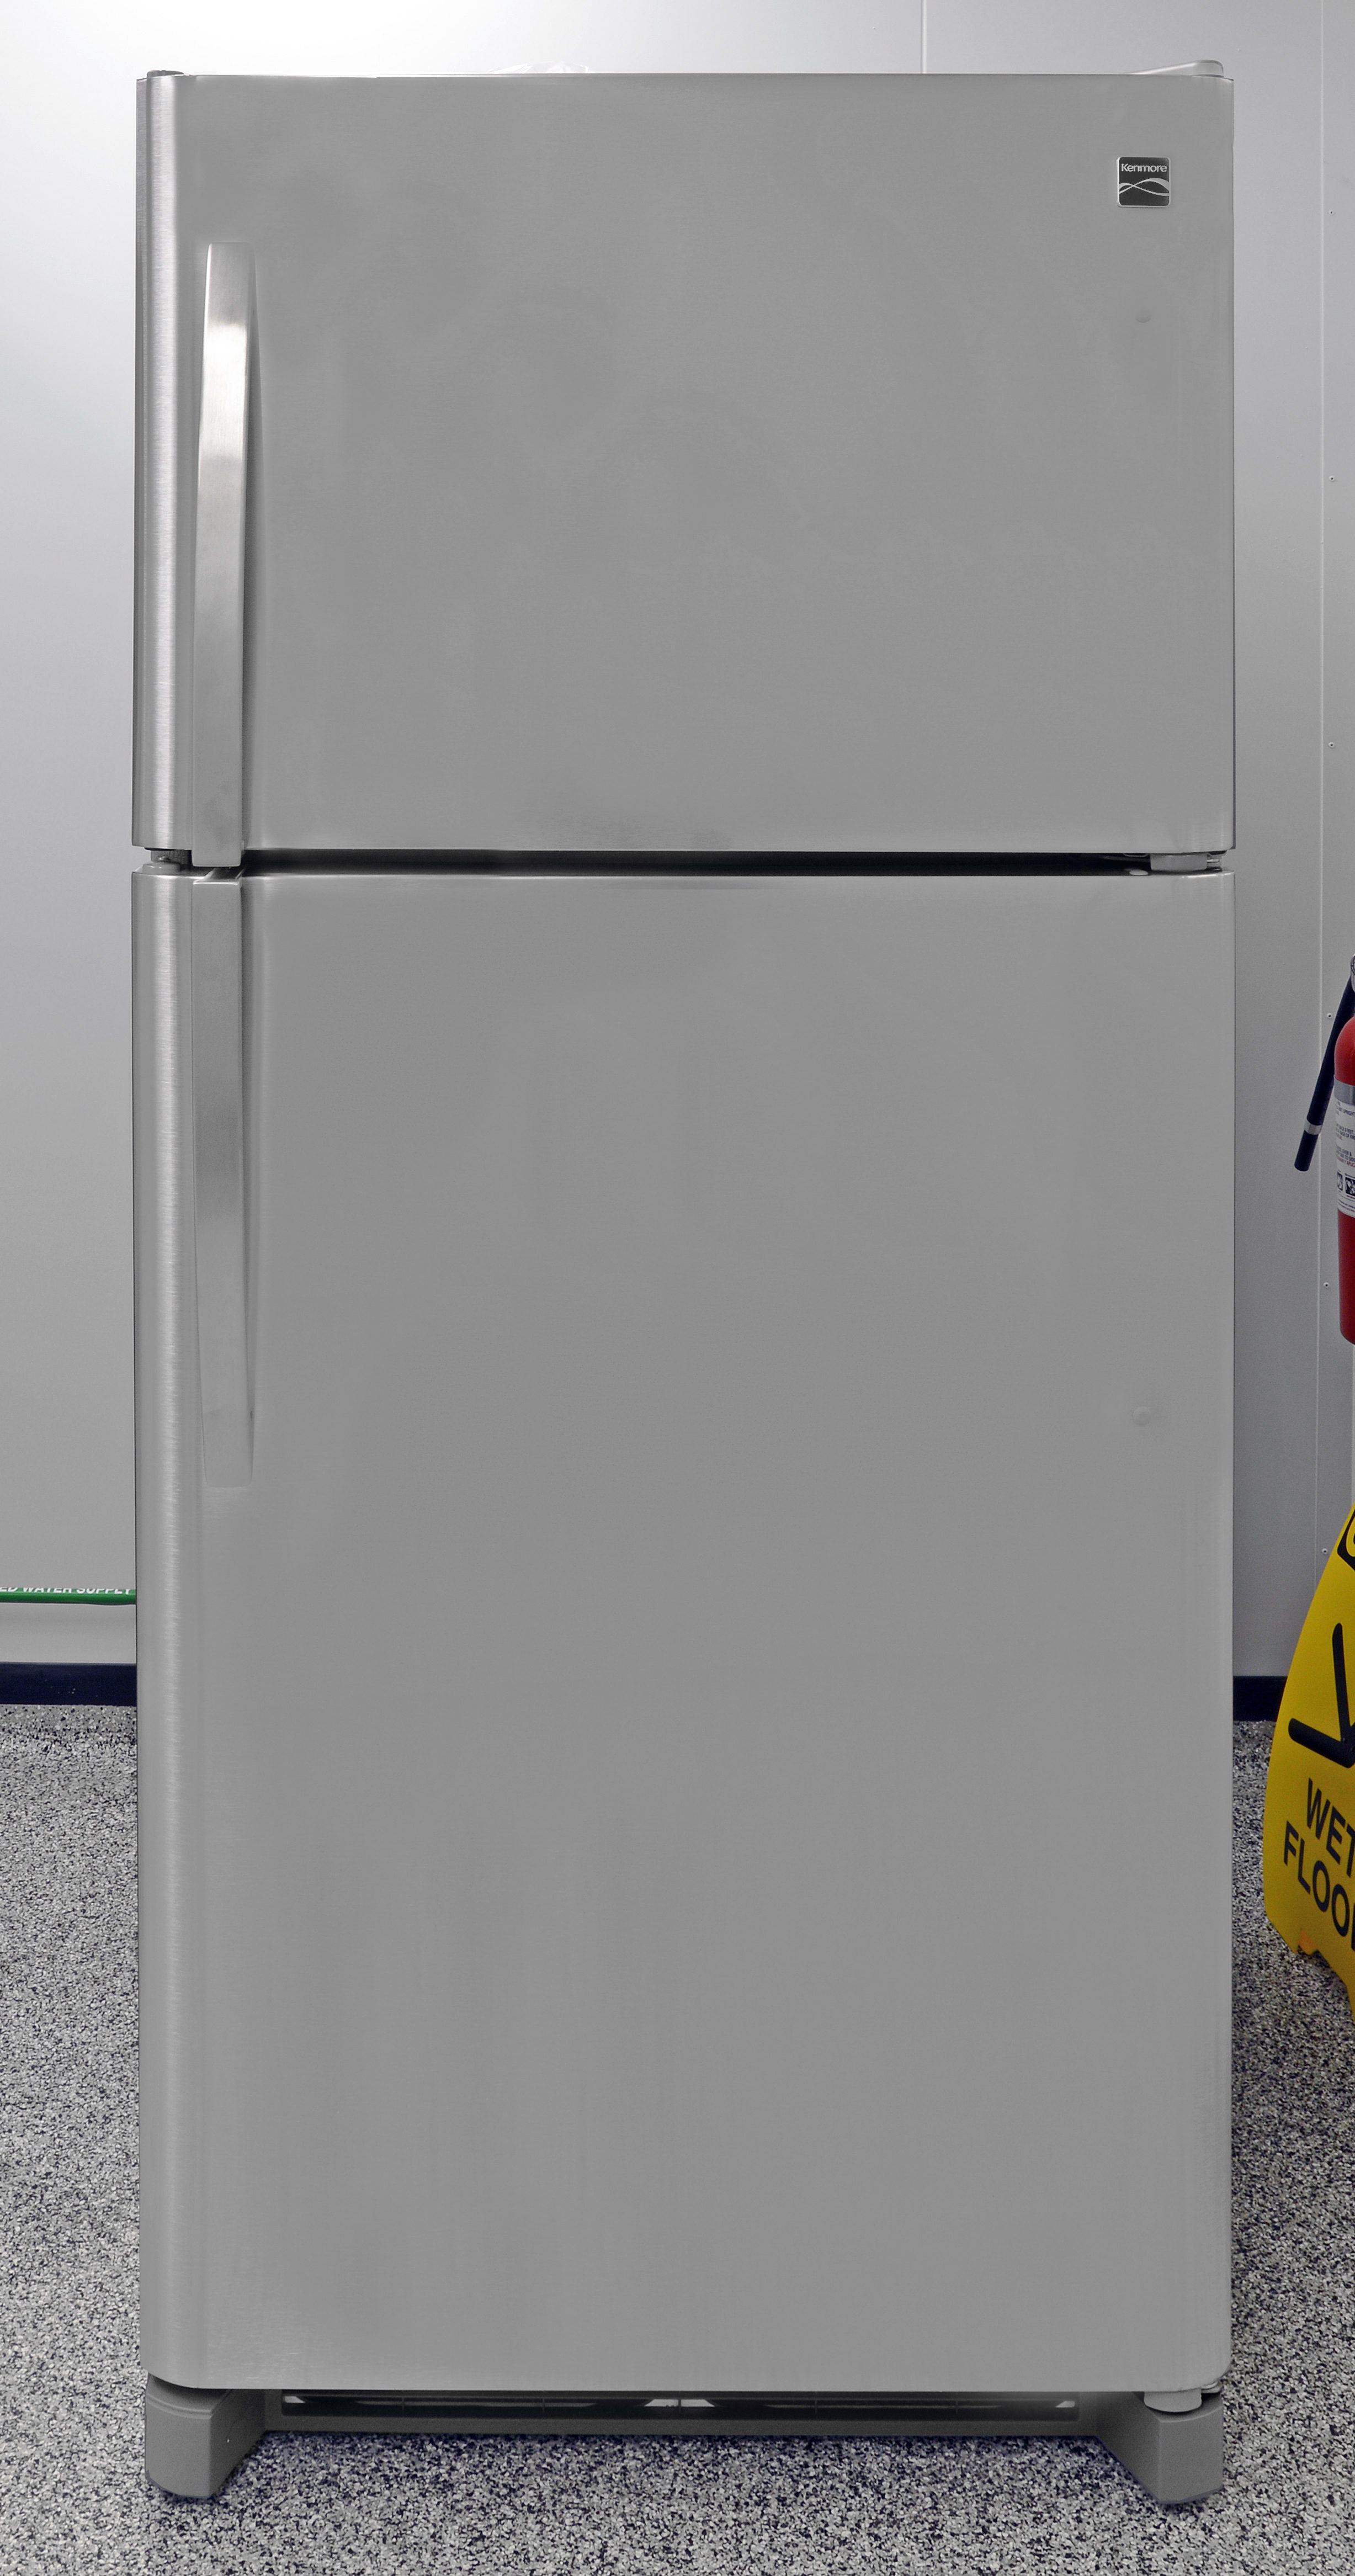 The Kenmore 70623 top freezer is built on a Frigidaire platform.